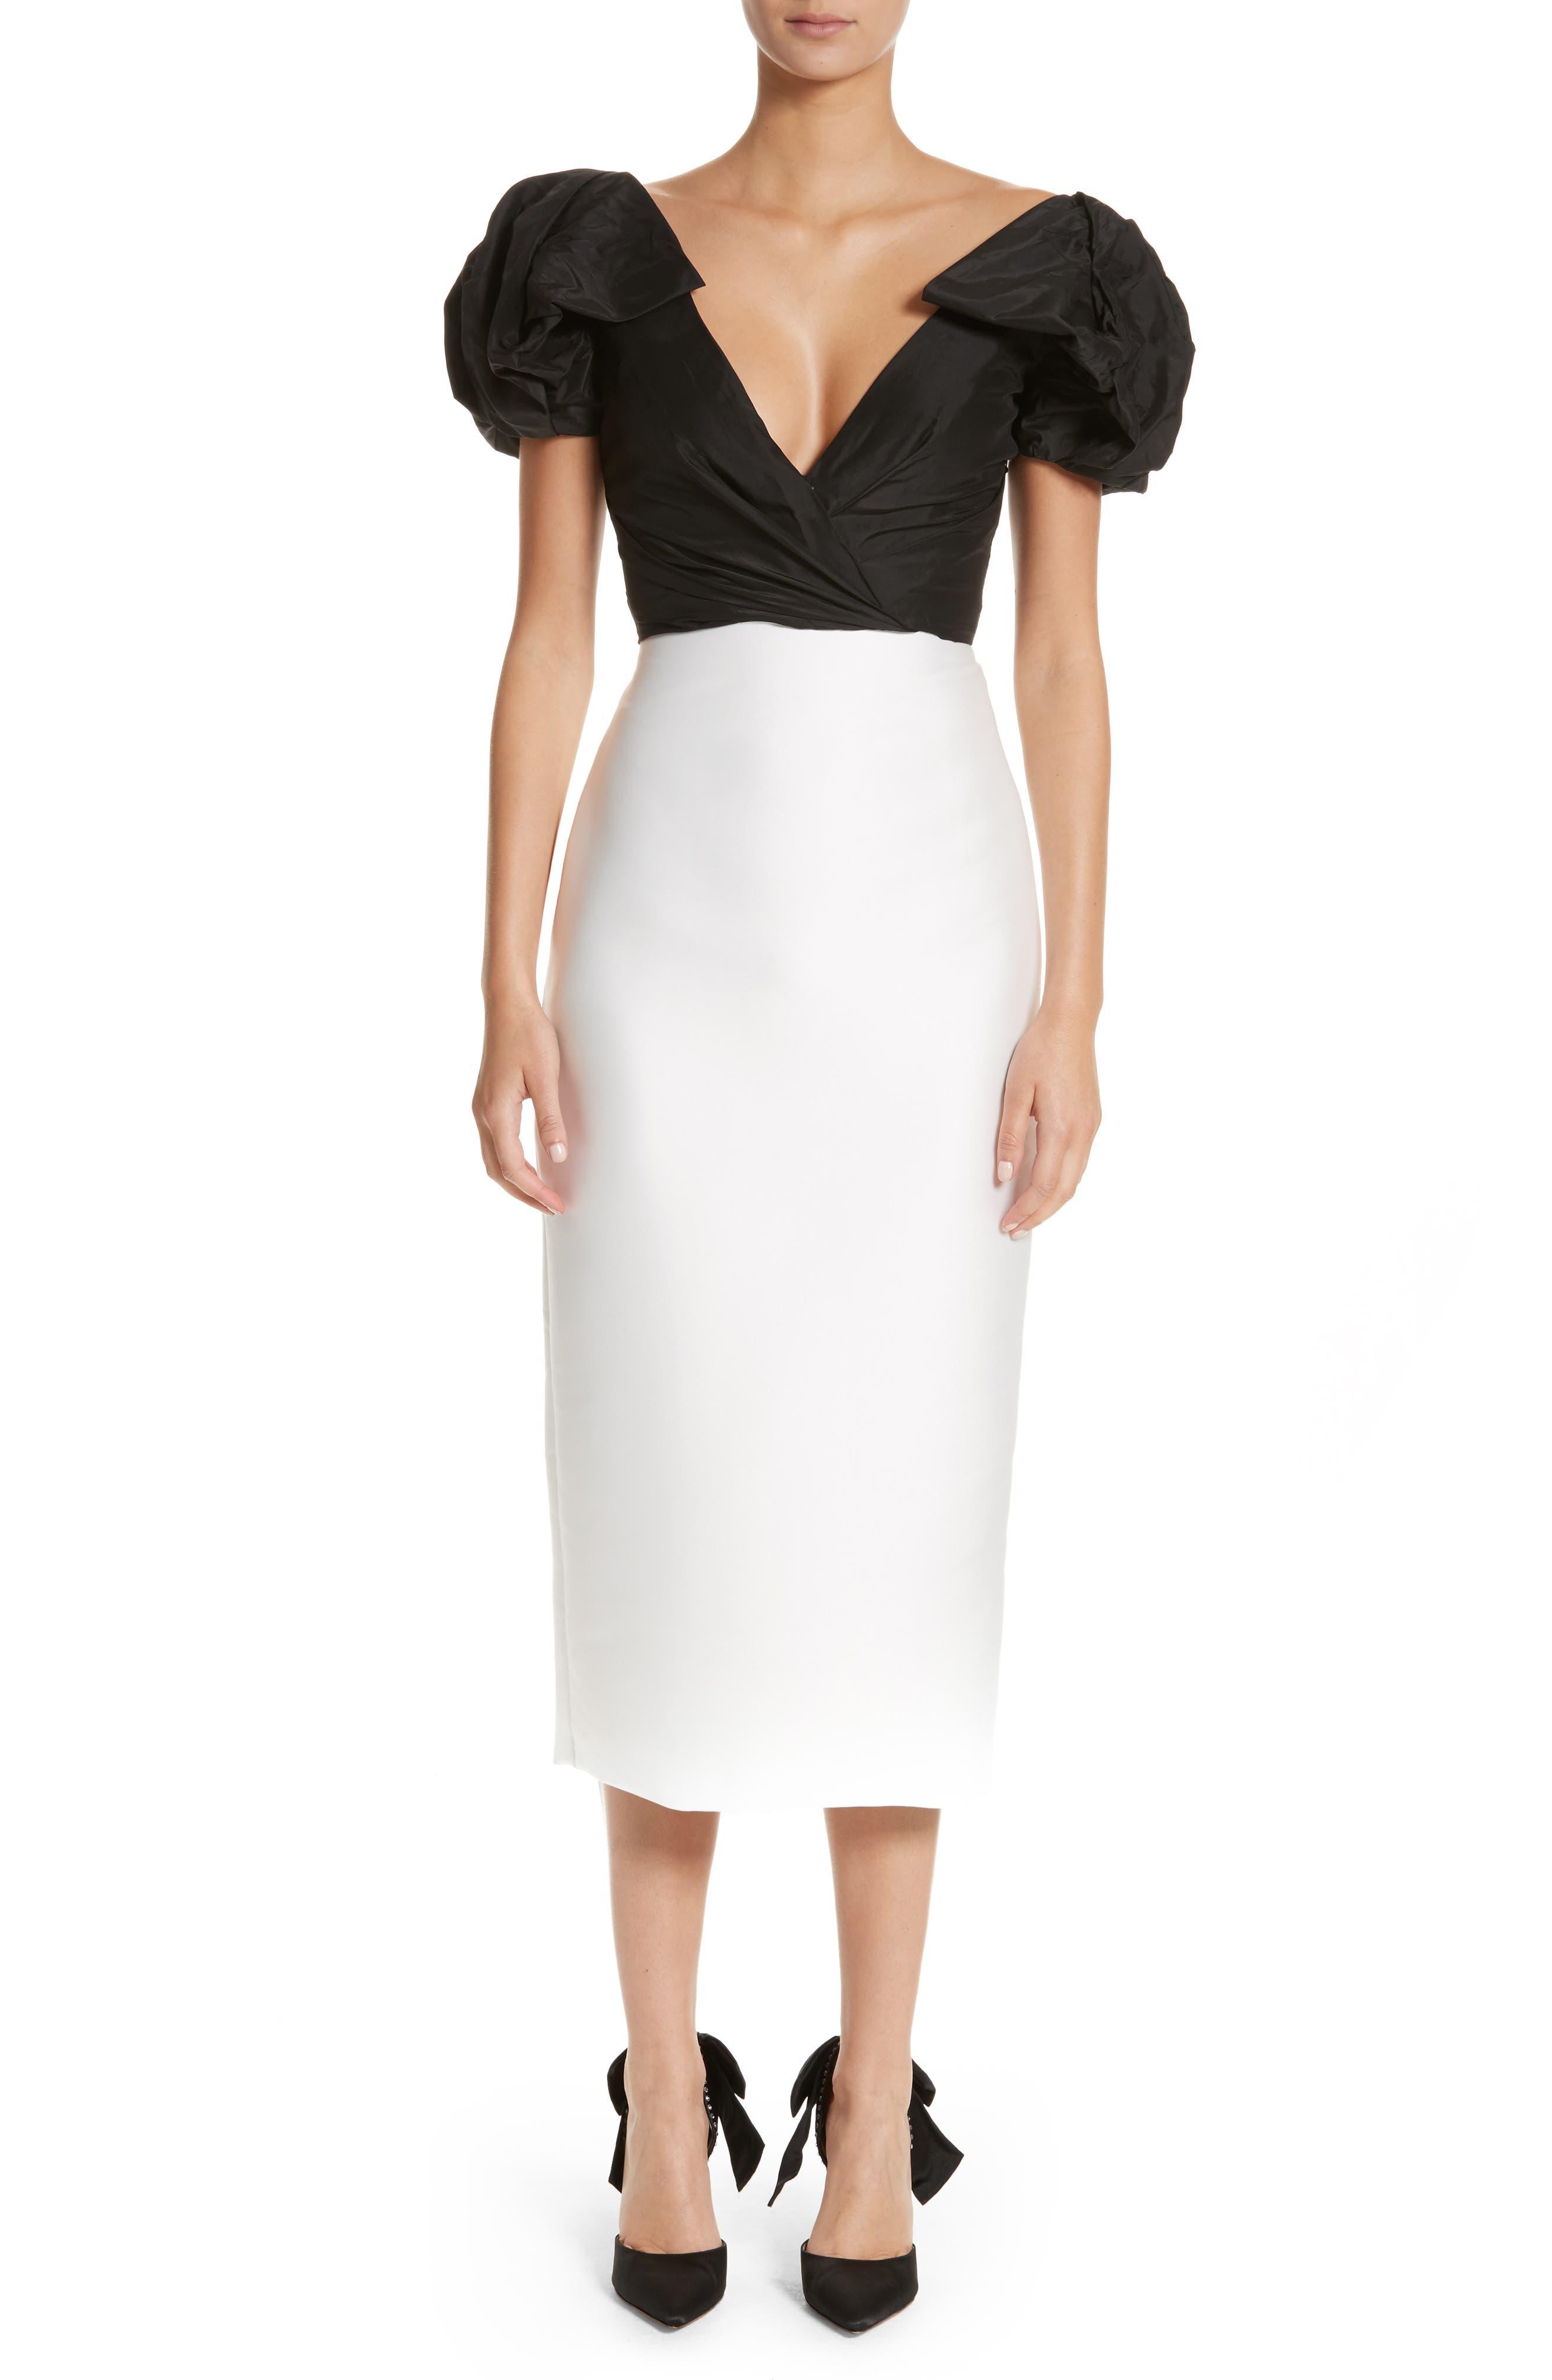 Alternate Image 1 Selected - Monique Lhuillier Puff Sleeve Mikado Sheath Dress